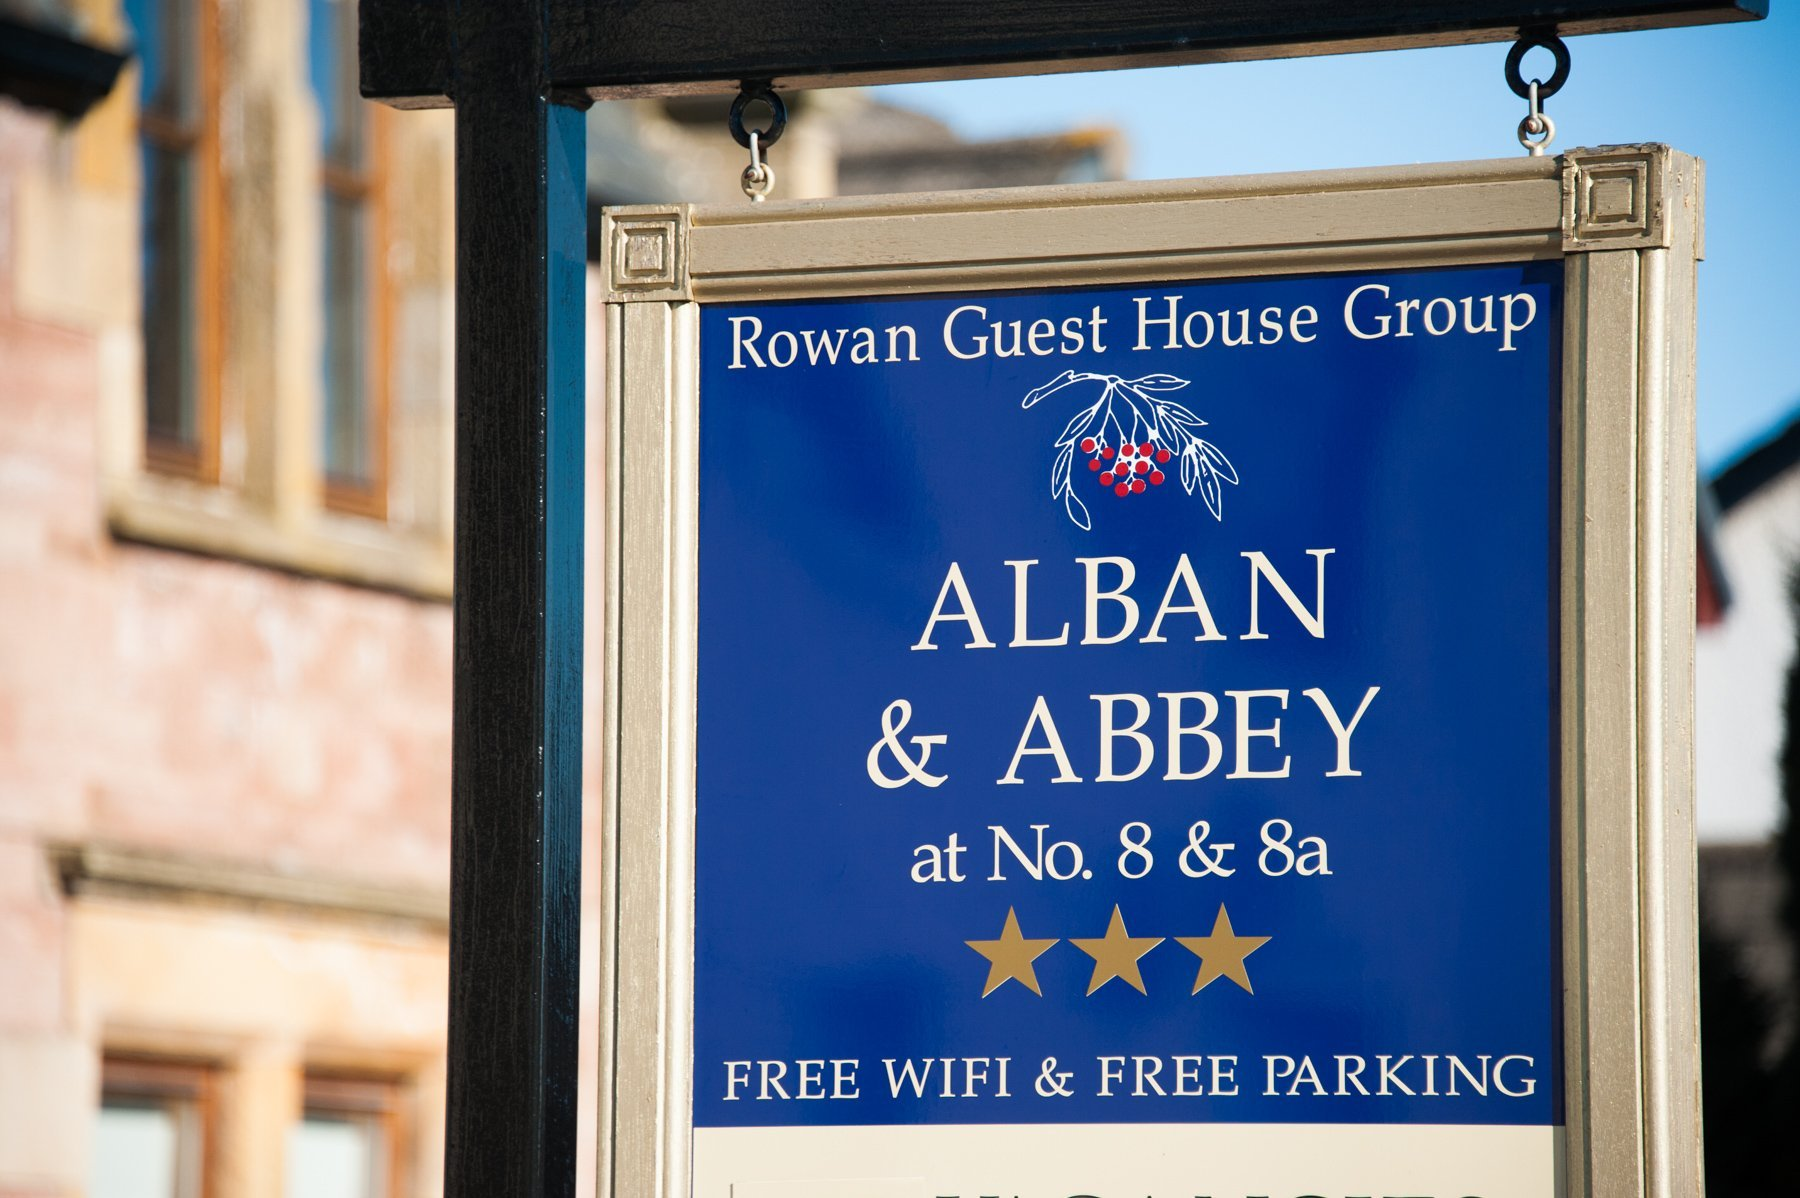 Alban-Abbey-006